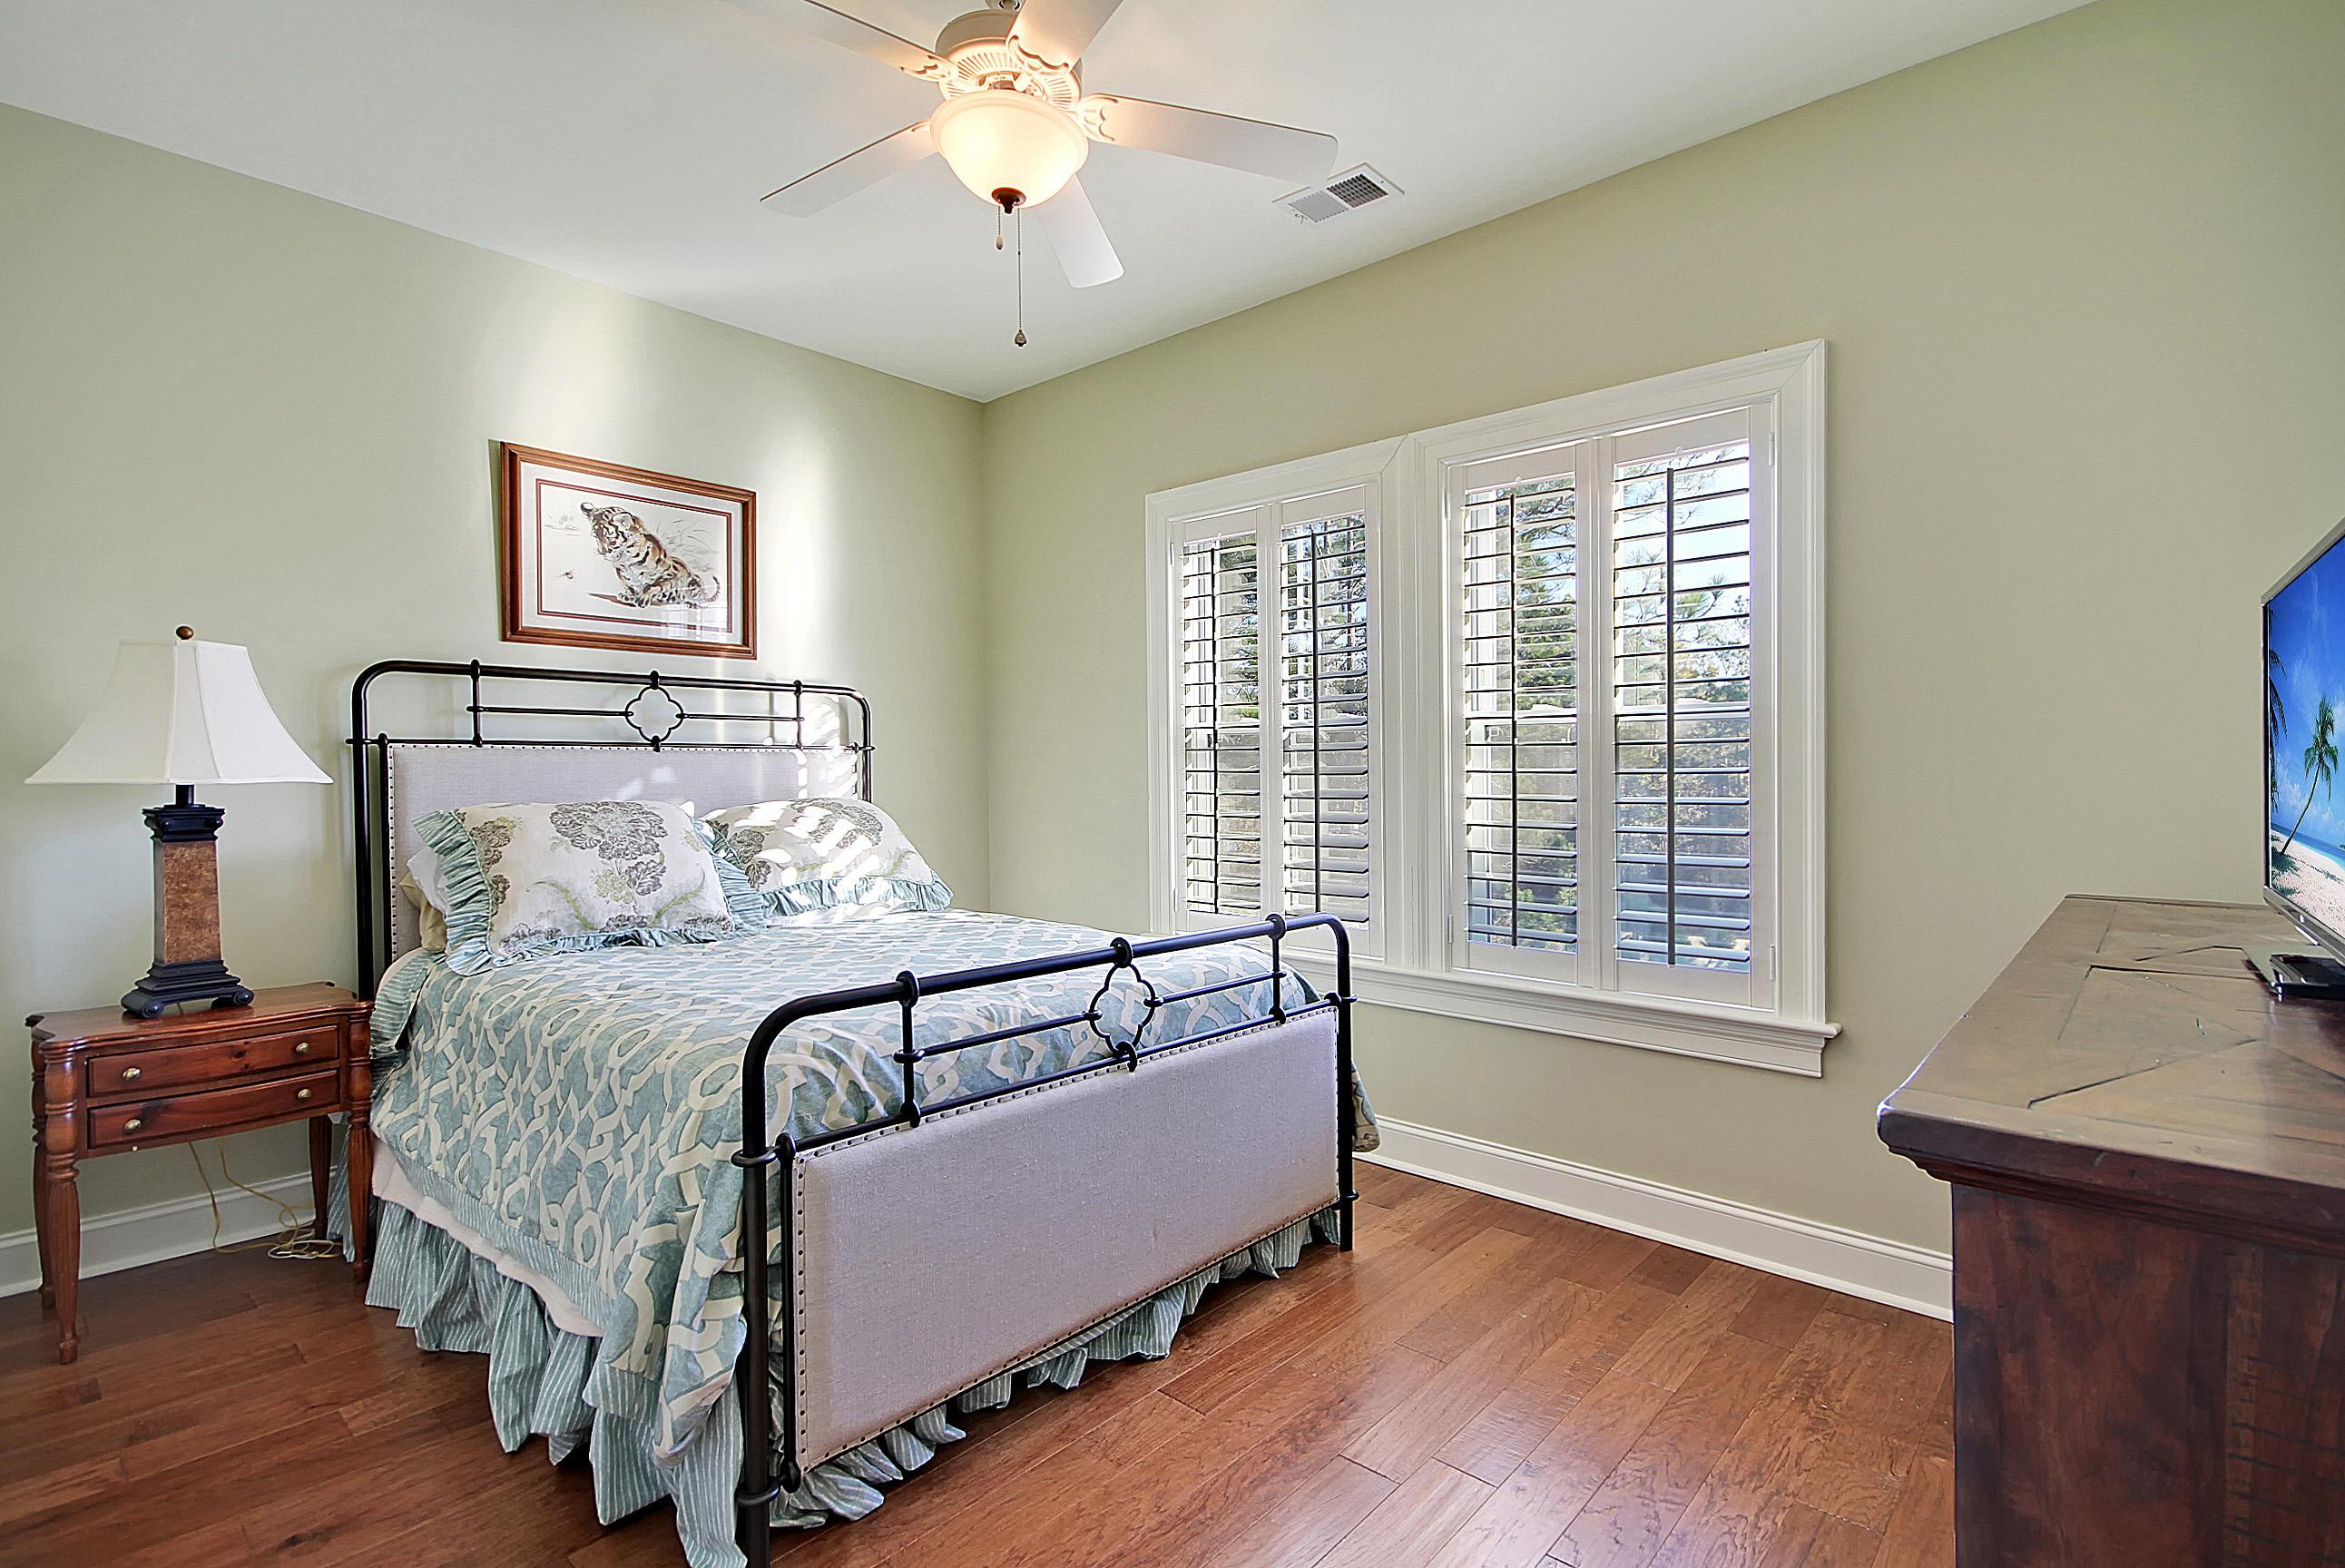 Rivertowne Country Club Homes For Sale - 2601 Kiln Creek, Mount Pleasant, SC - 55